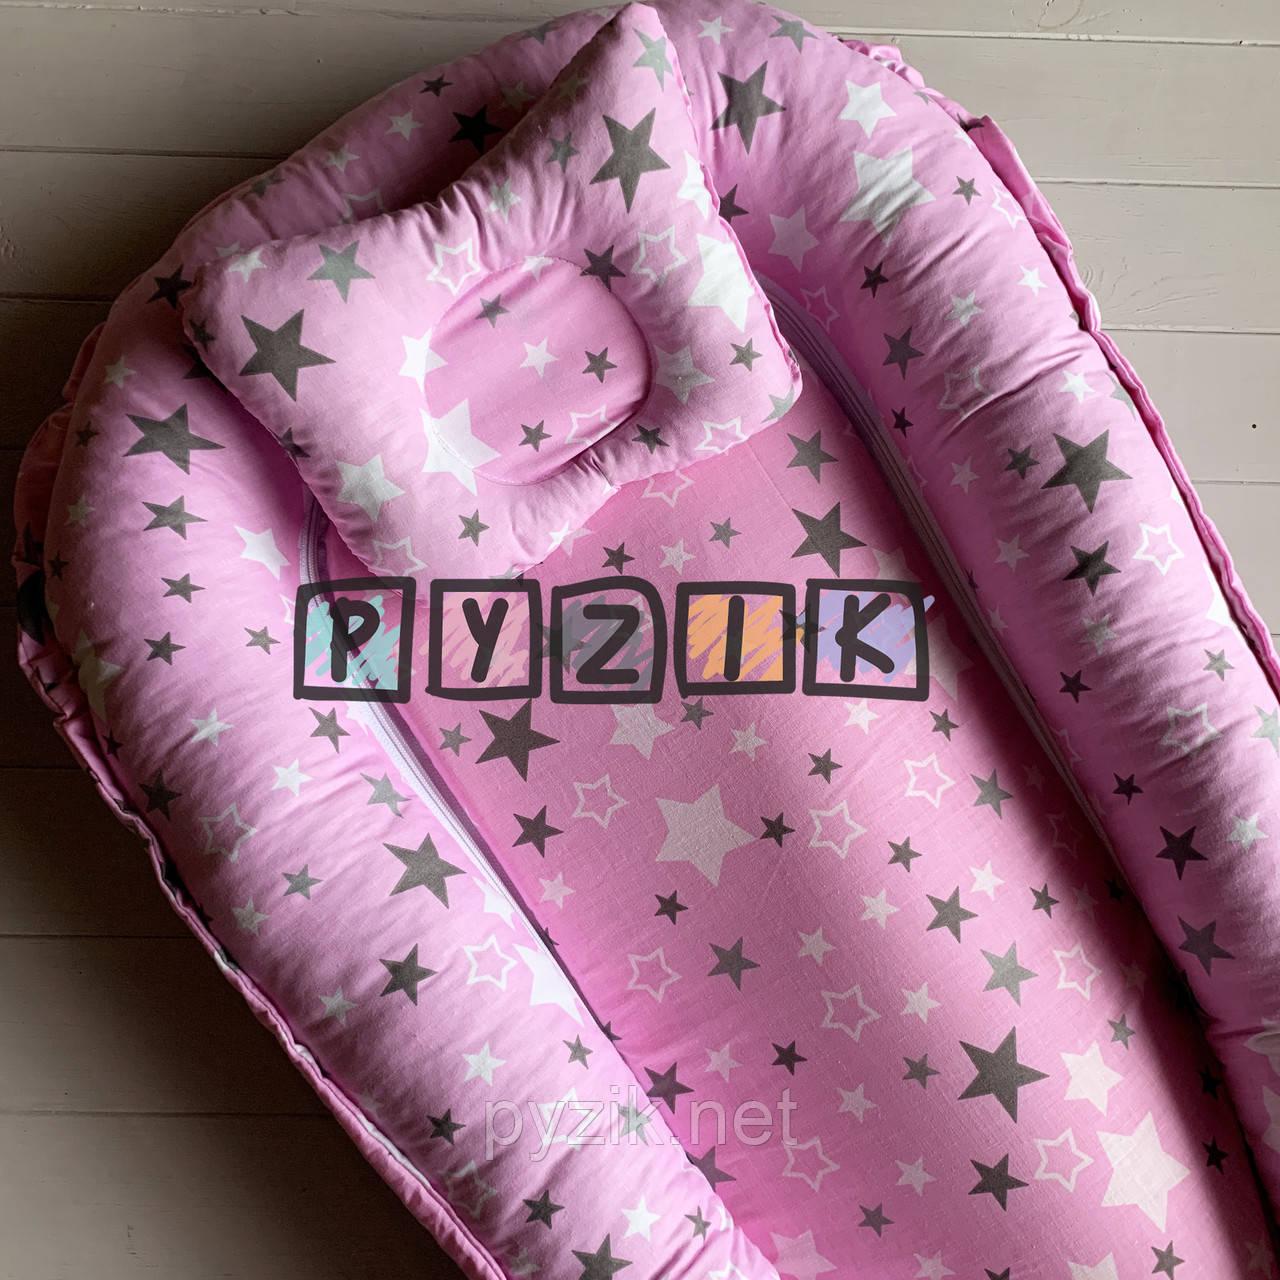 Гнездо-кокон для новорожденного 85Х40 см (подушка для беременной, подушка для кормления) Звездочка розовое